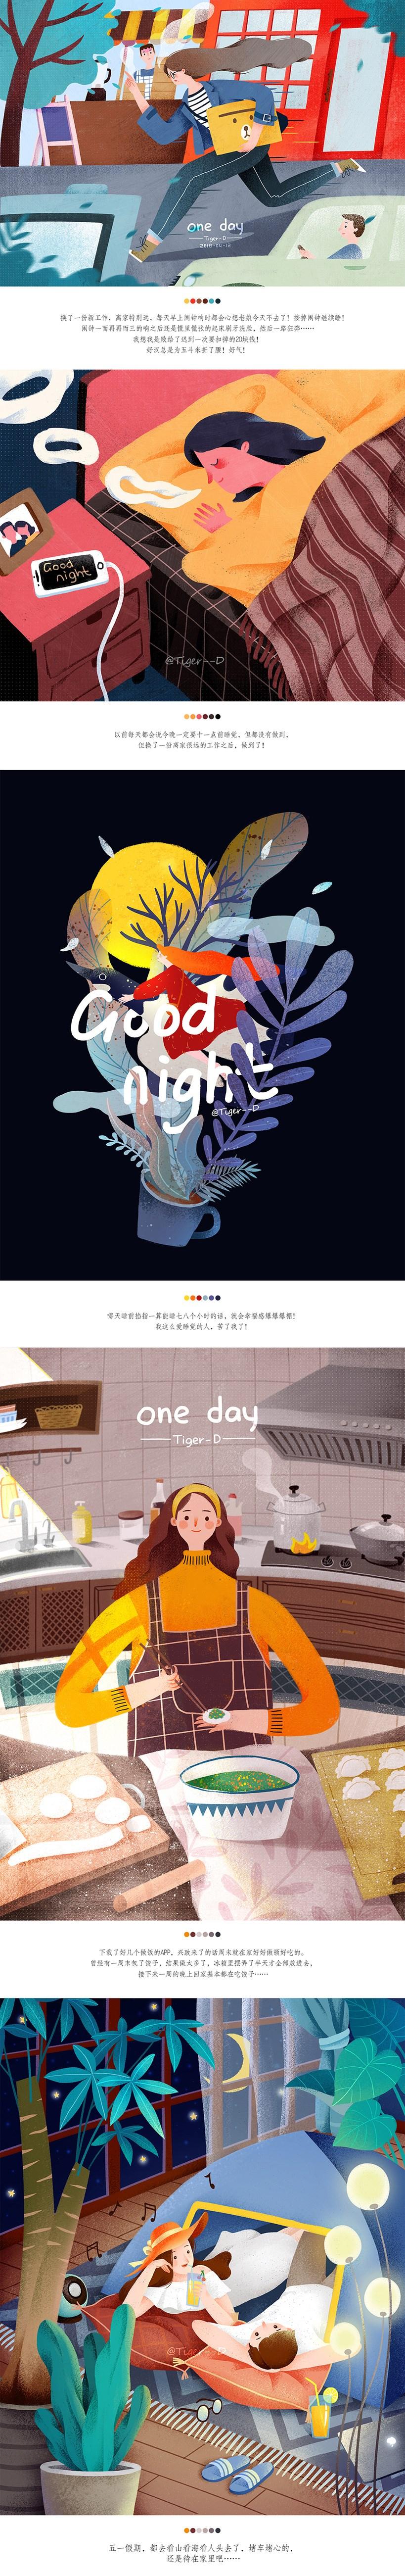 one day一天—插画欣赏